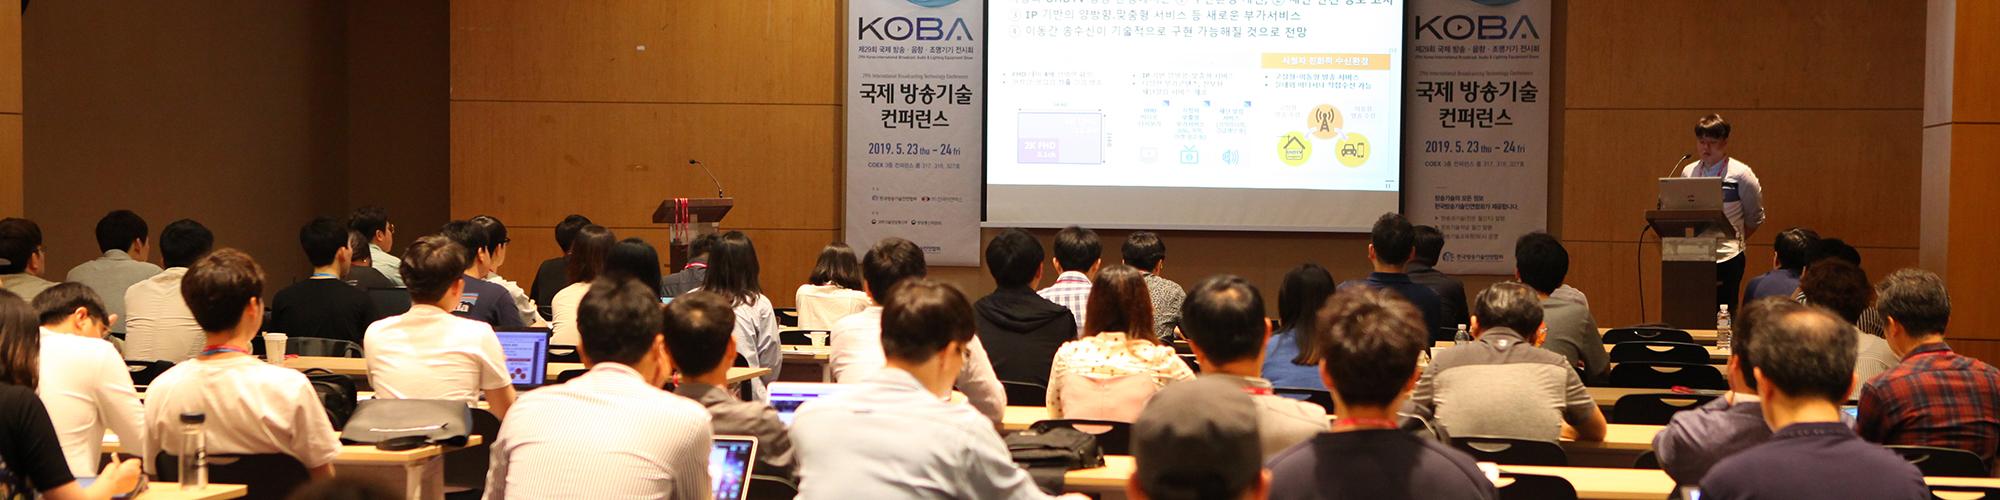 KOBA 2019 컨퍼런스